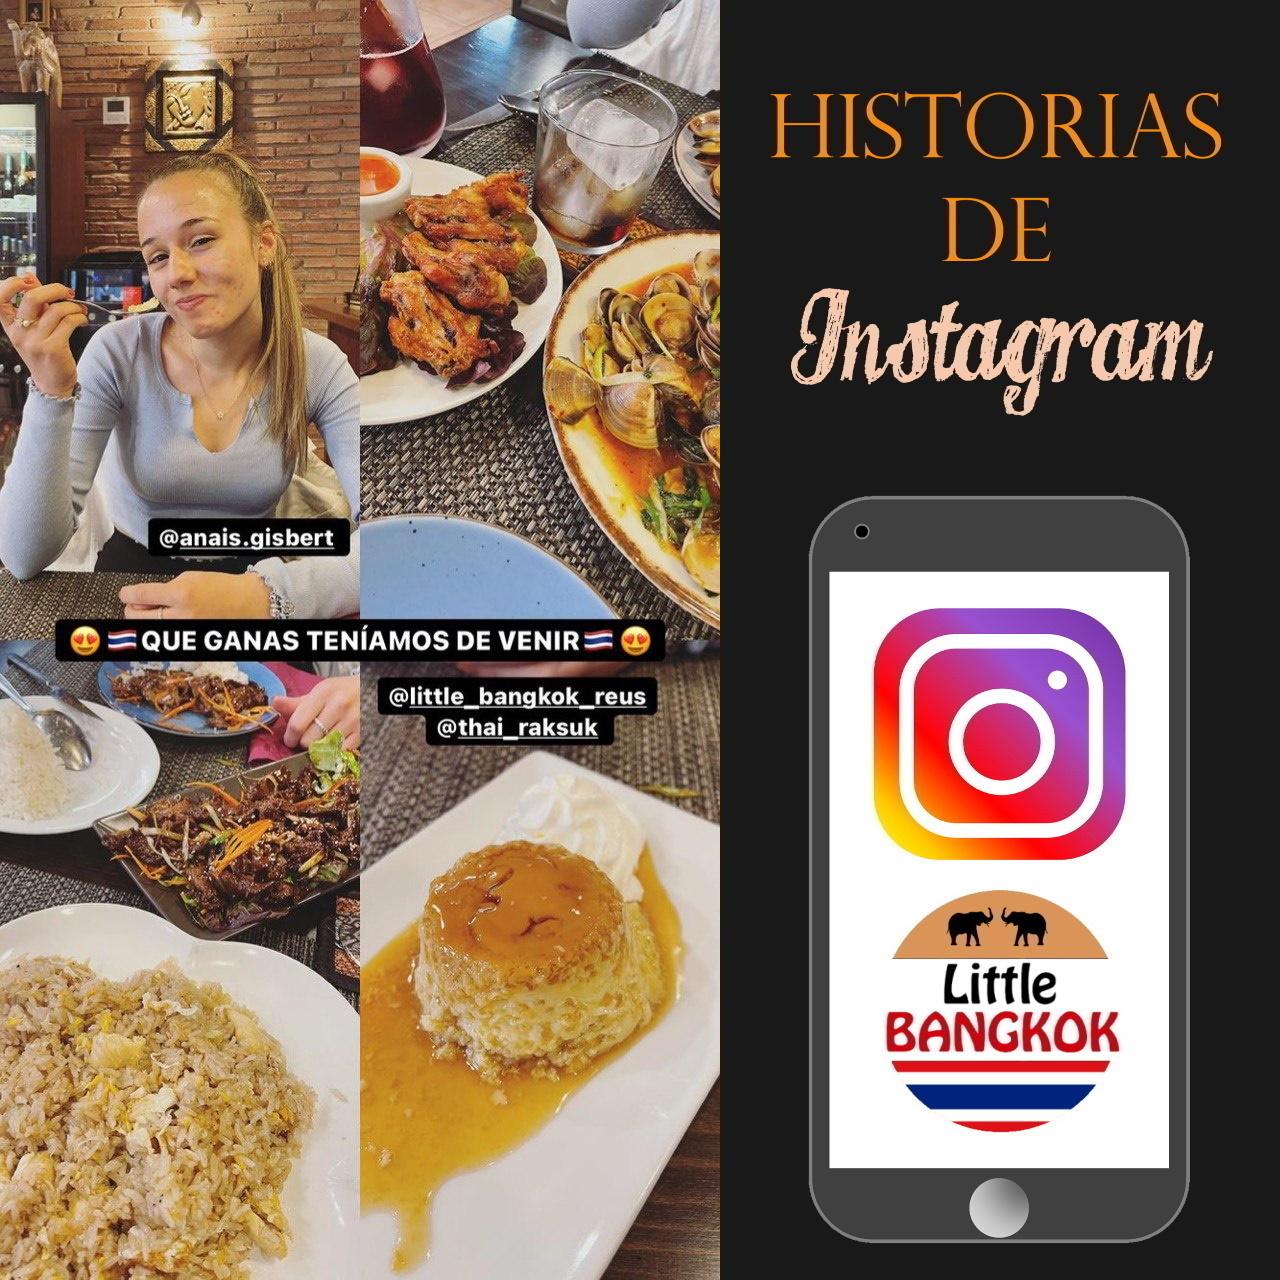 Historias de Instagram - 04 - Abril 1